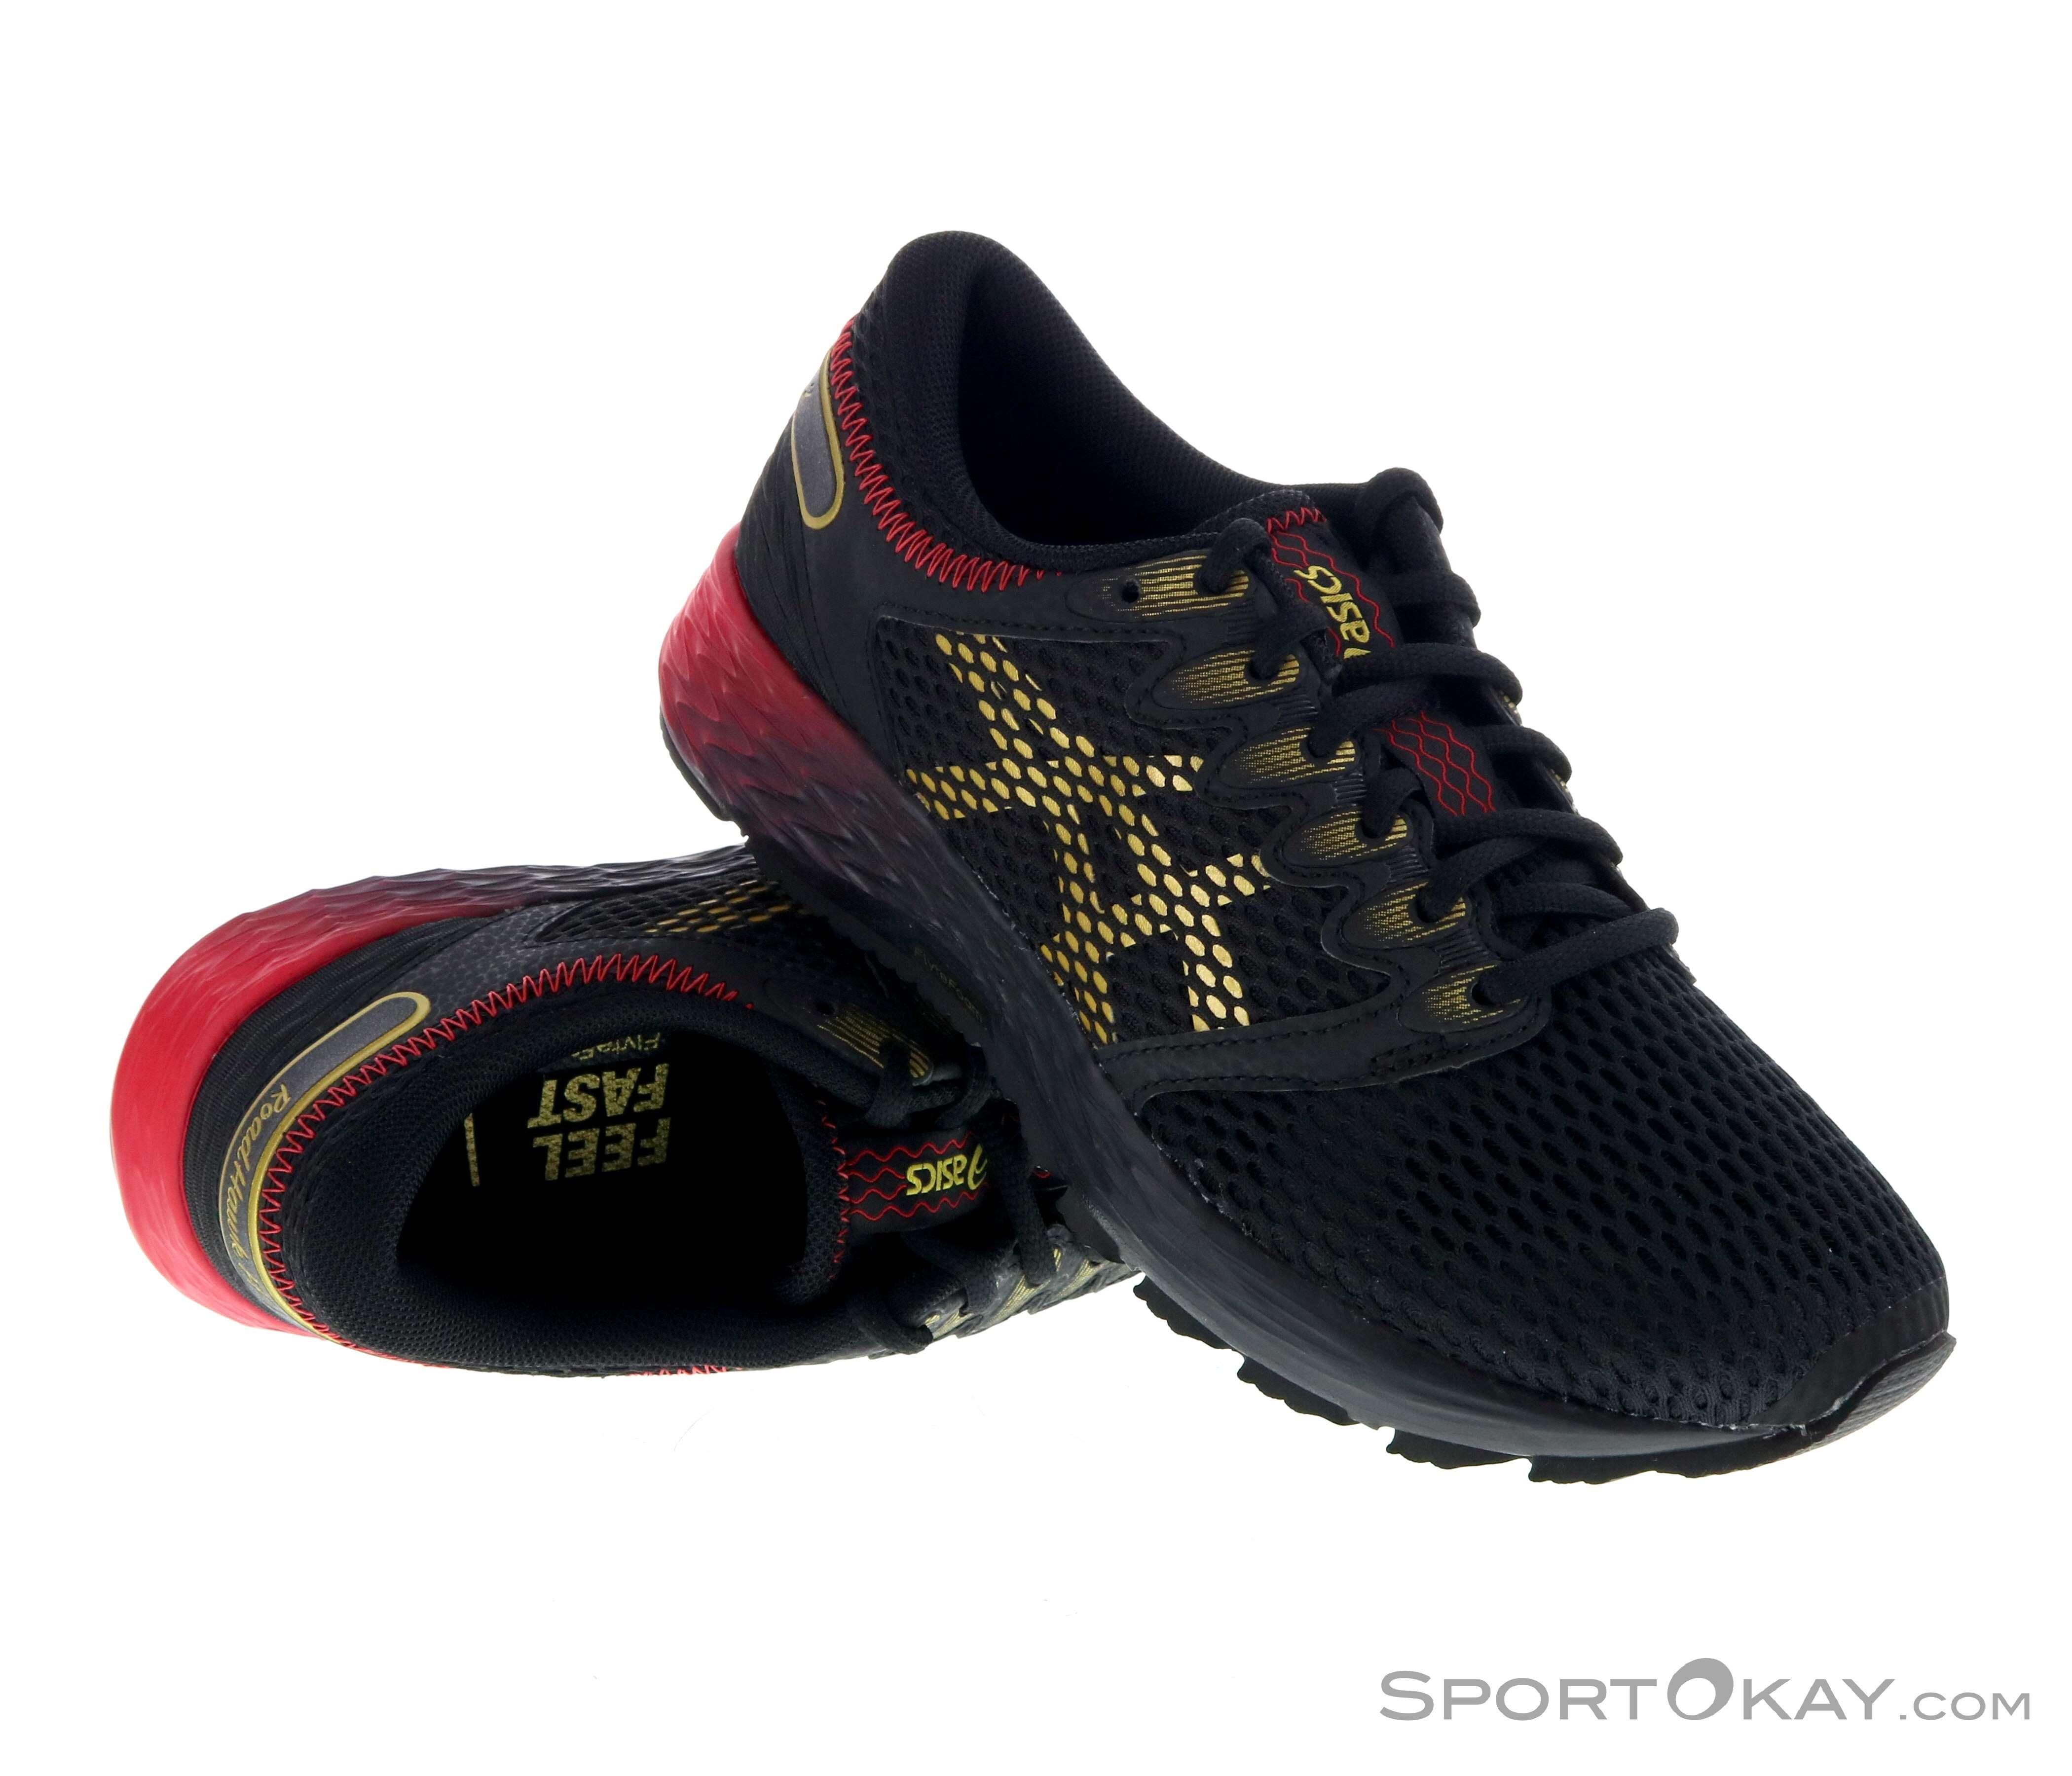 Asics Roadhawk FF2 Womens Running Shoes